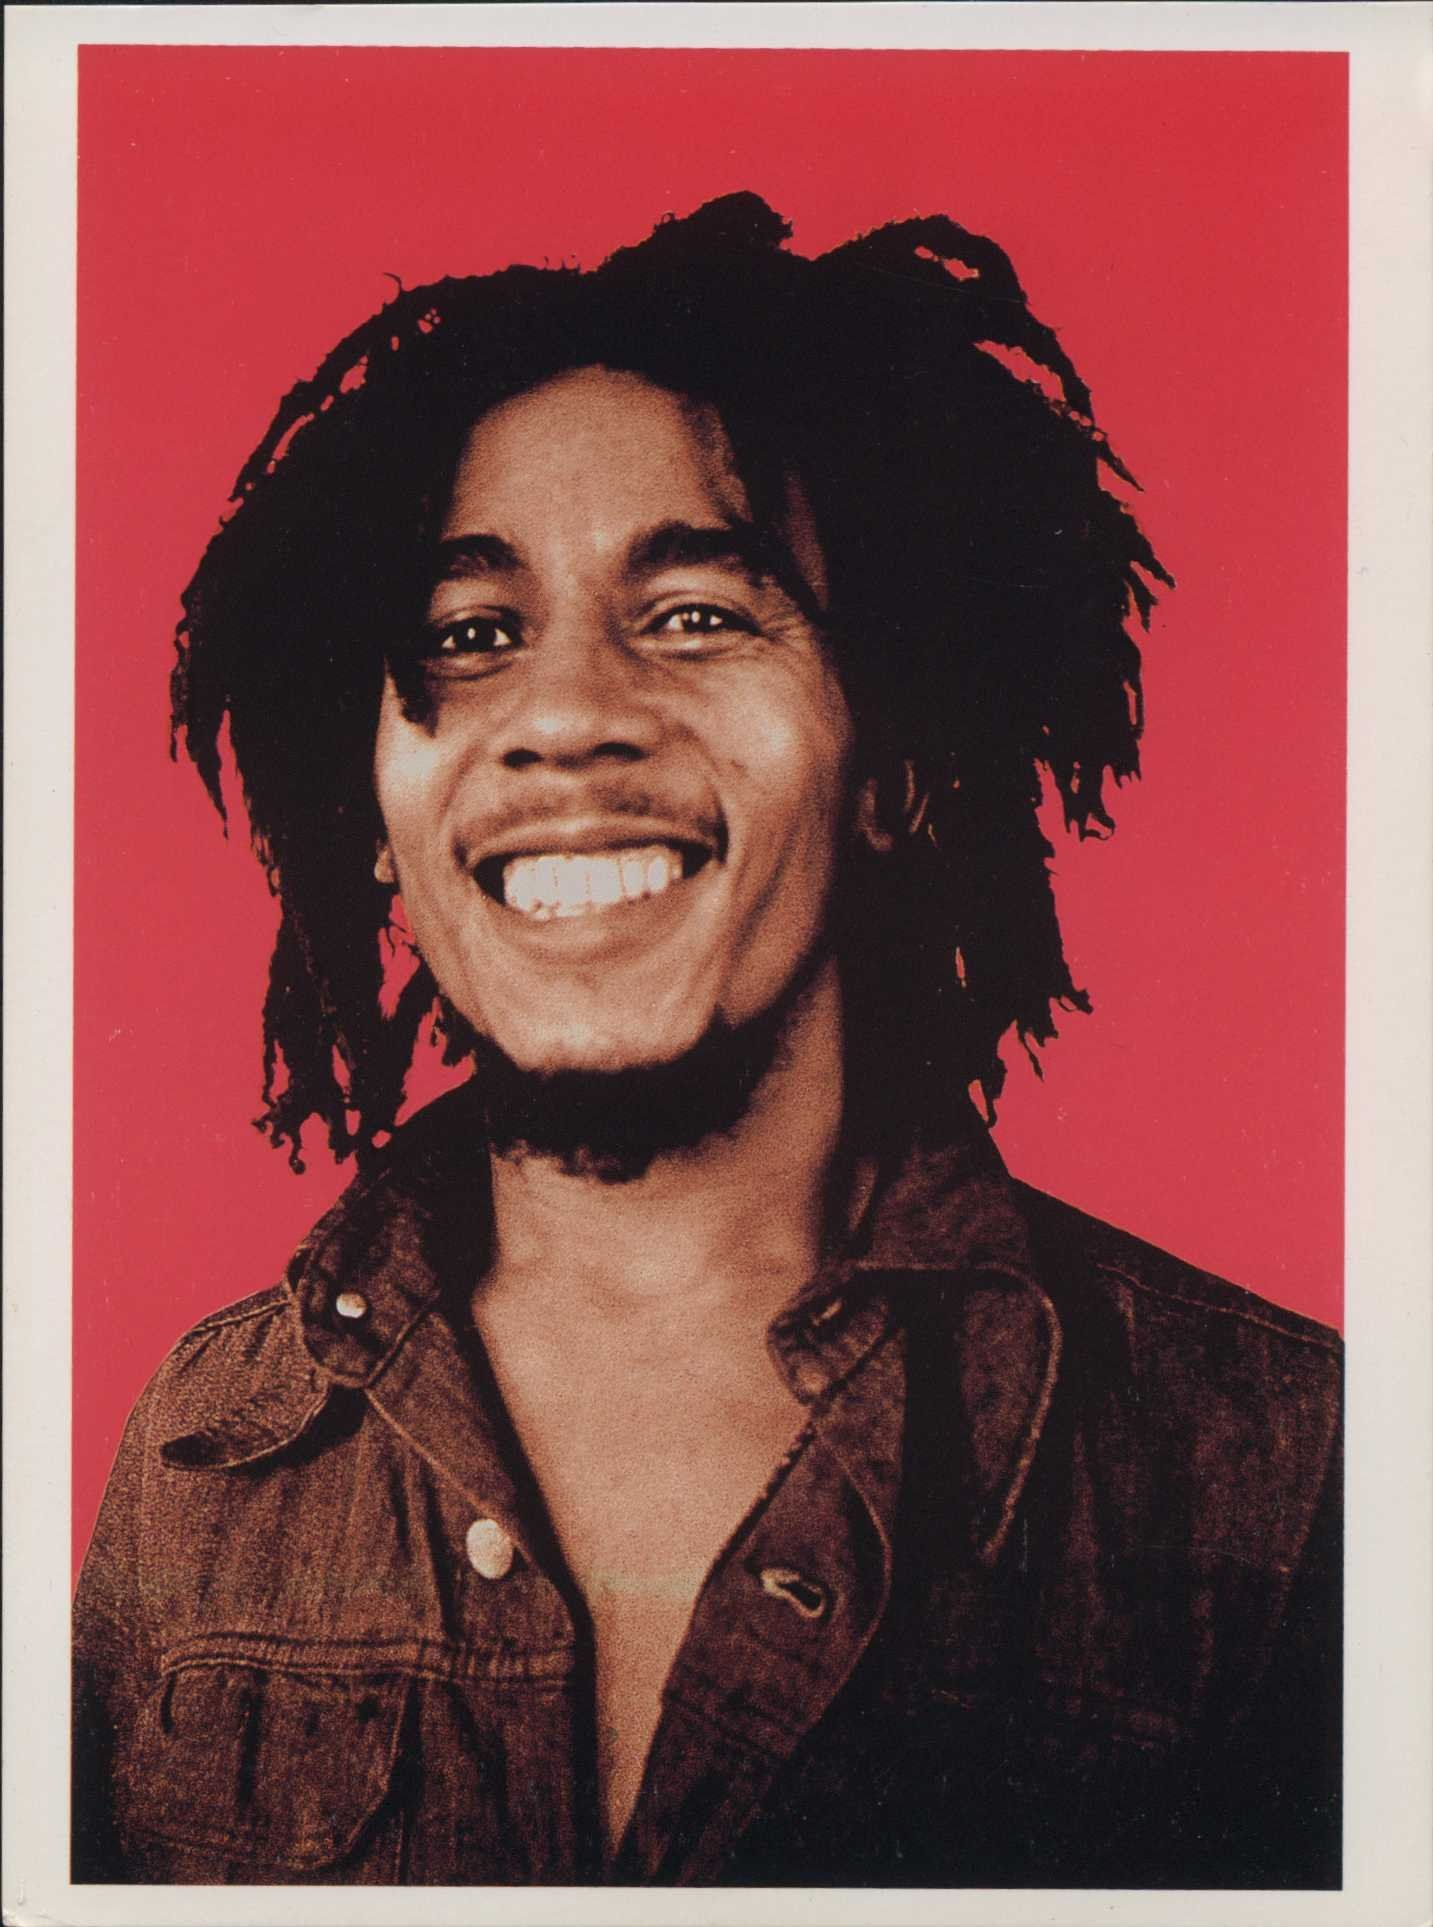 Reggae & Ska Music Memorabilia BOB MARLEY ~ RED PORTRAIT POSTER Music